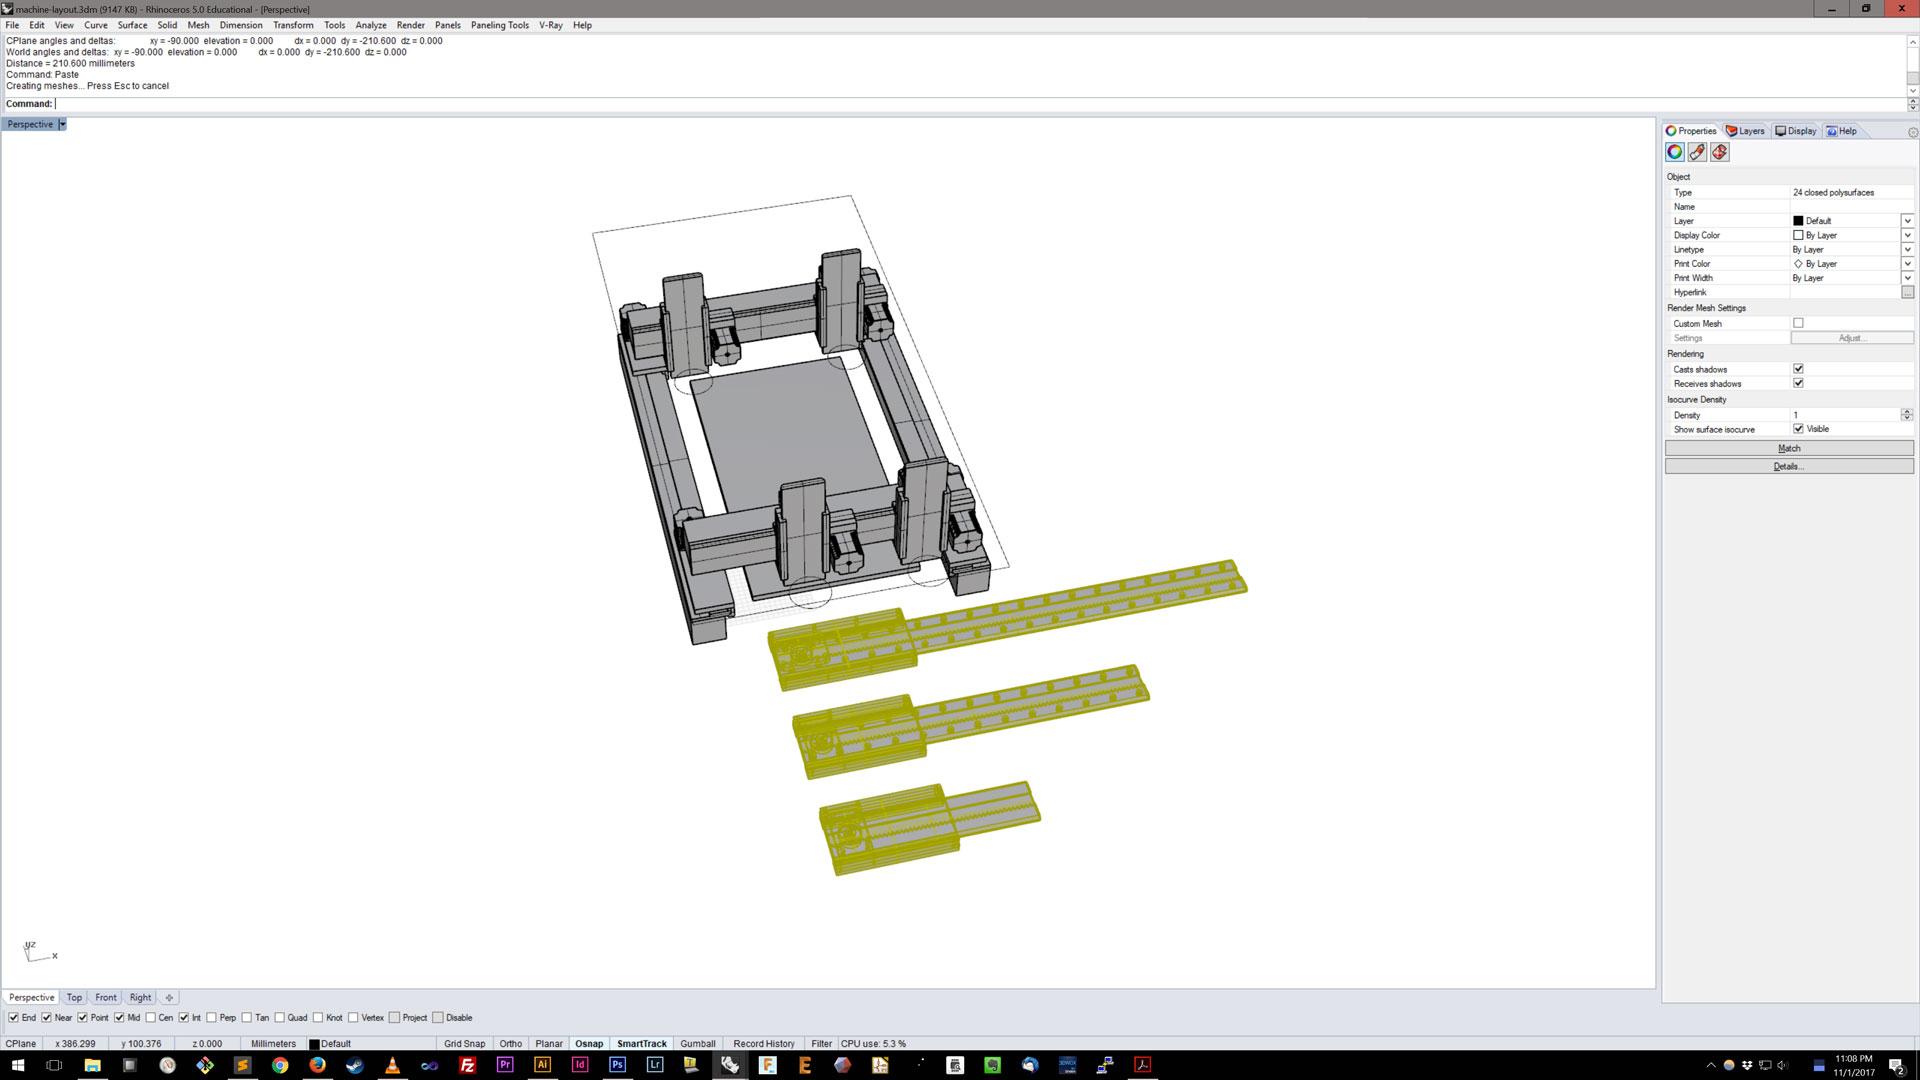 images/begin-layout.jpg